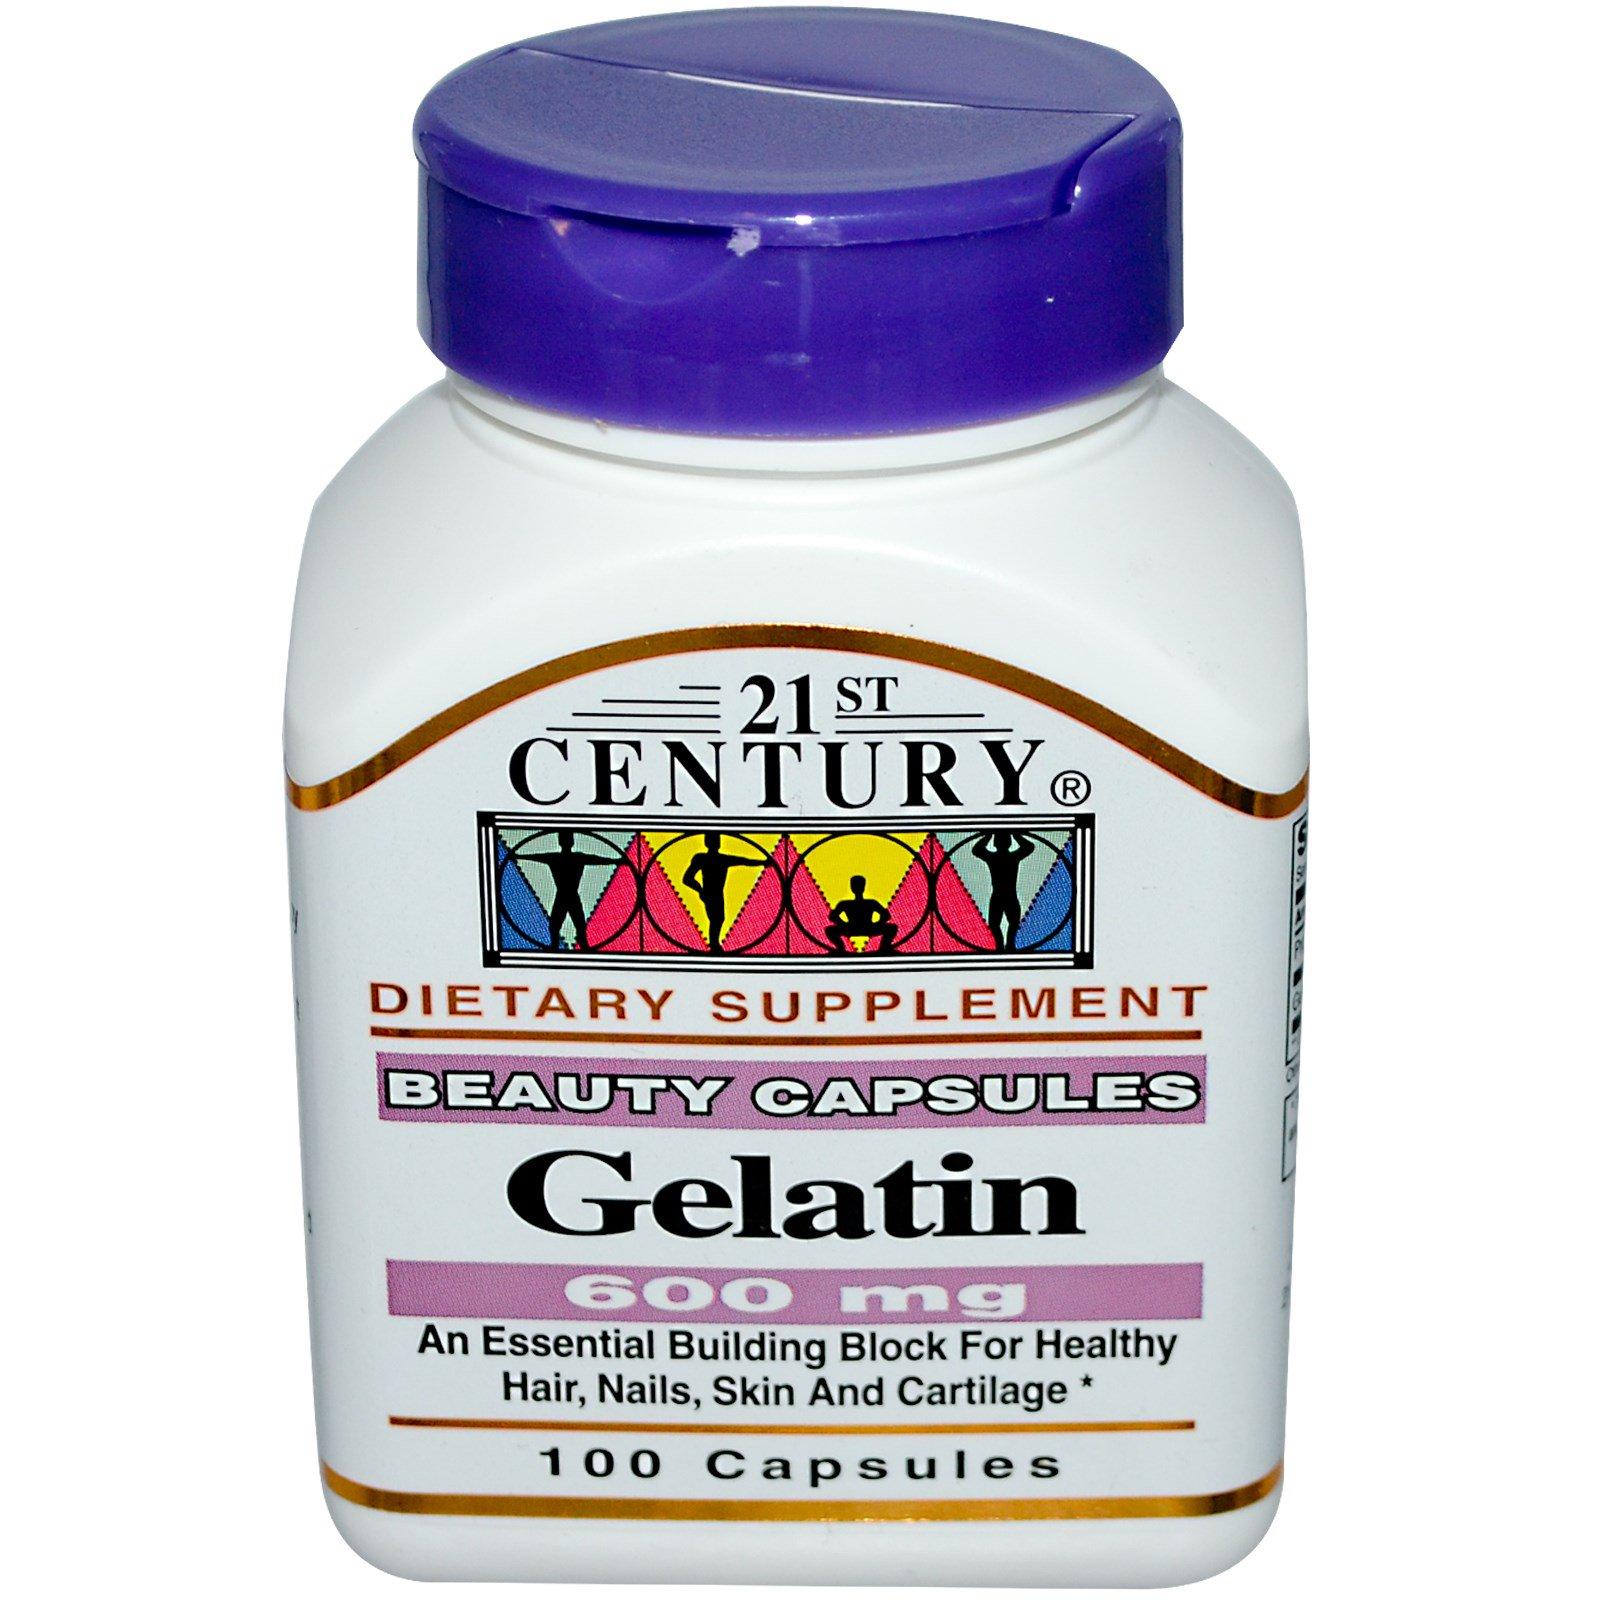 21st Century, Gelatin, 600 mg, 100 Capsules - iHerb.com